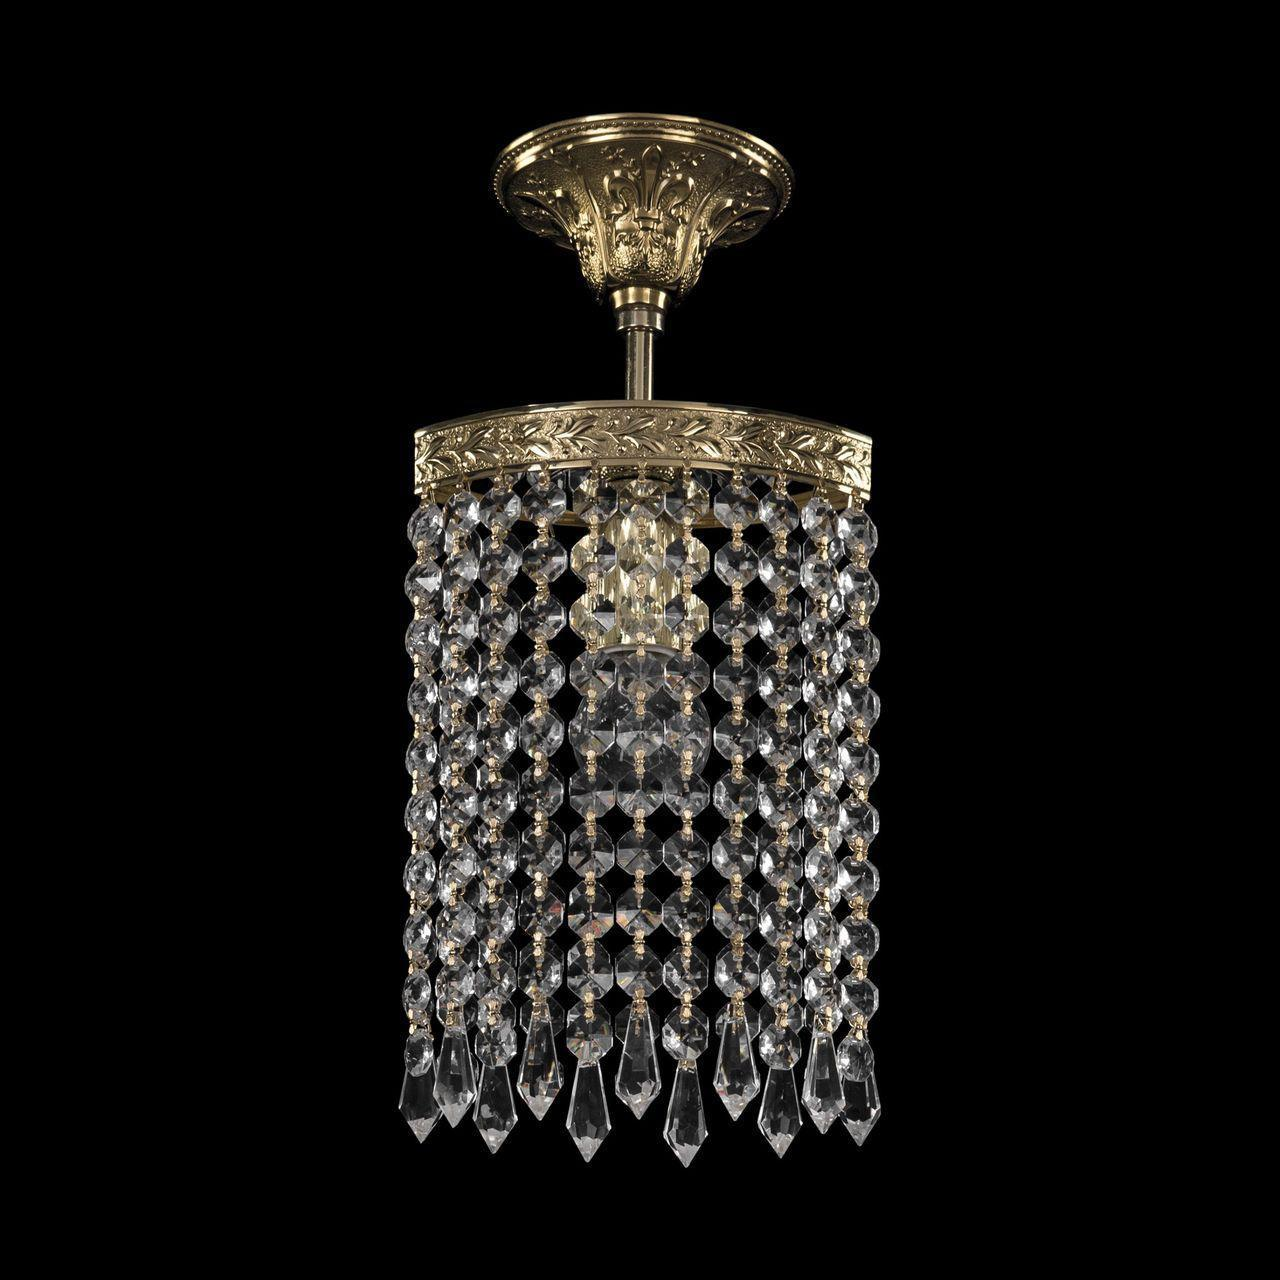 Подвесной светильник Bohemia Ivele 19203/15IV G Drops